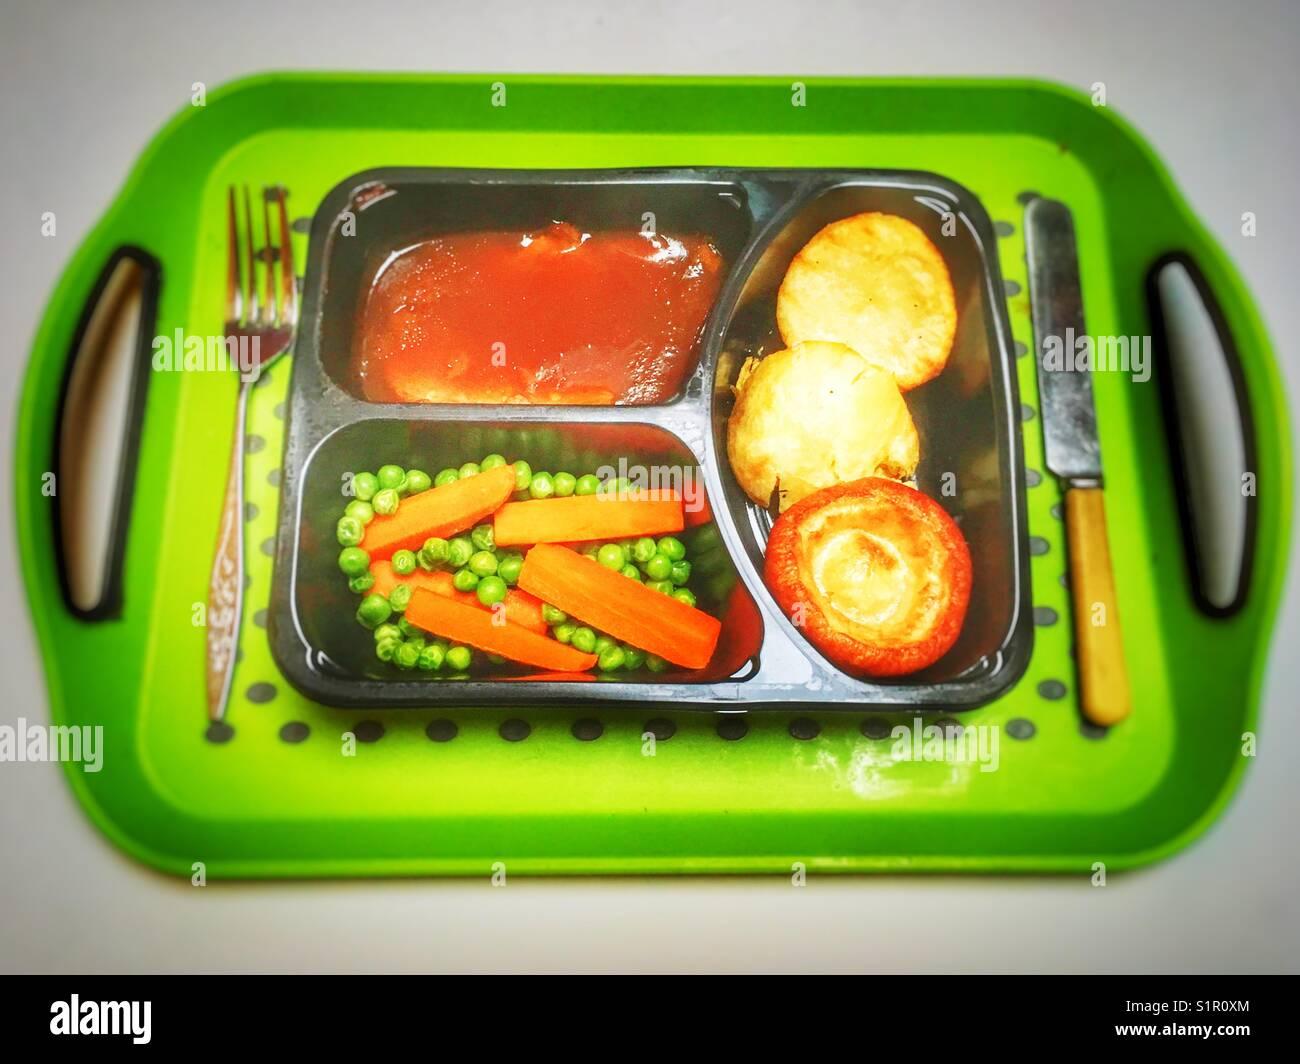 Individual TV dinner - Stock Image